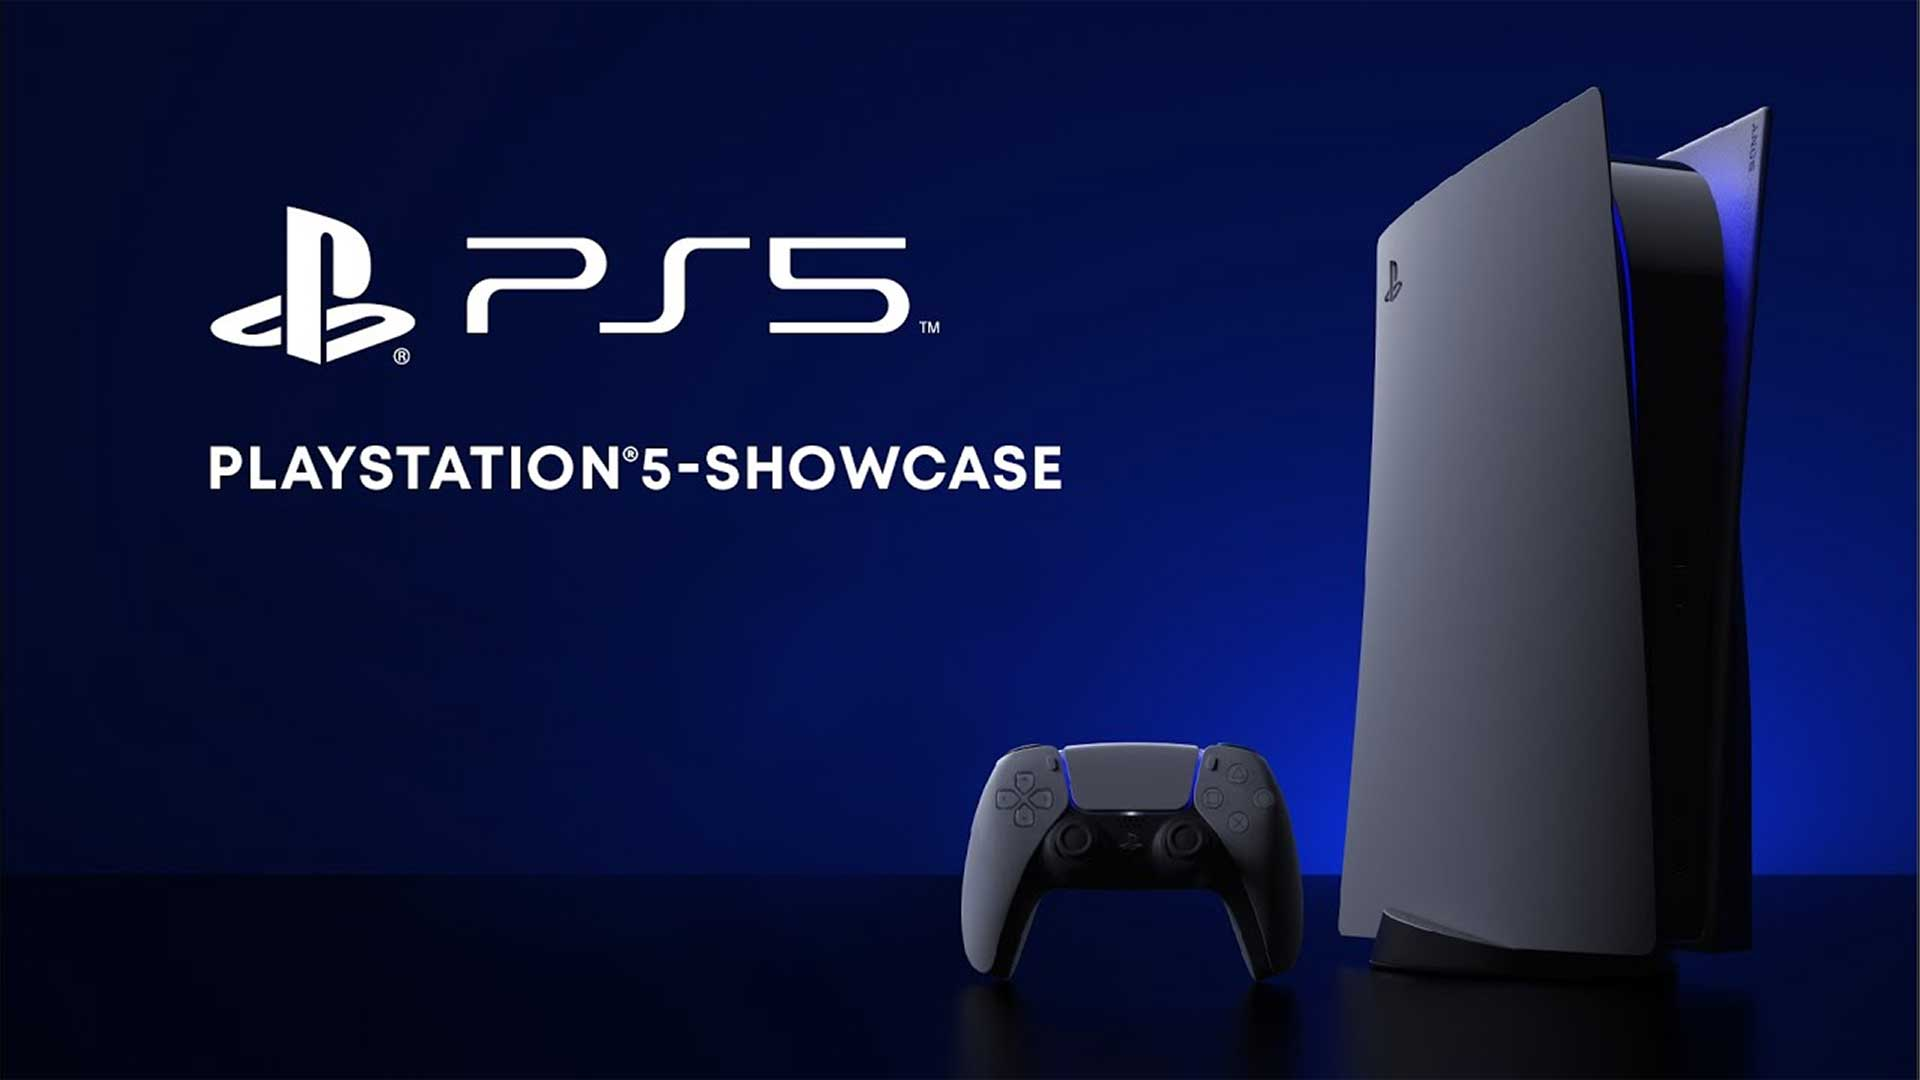 sony playstation 5 showcase